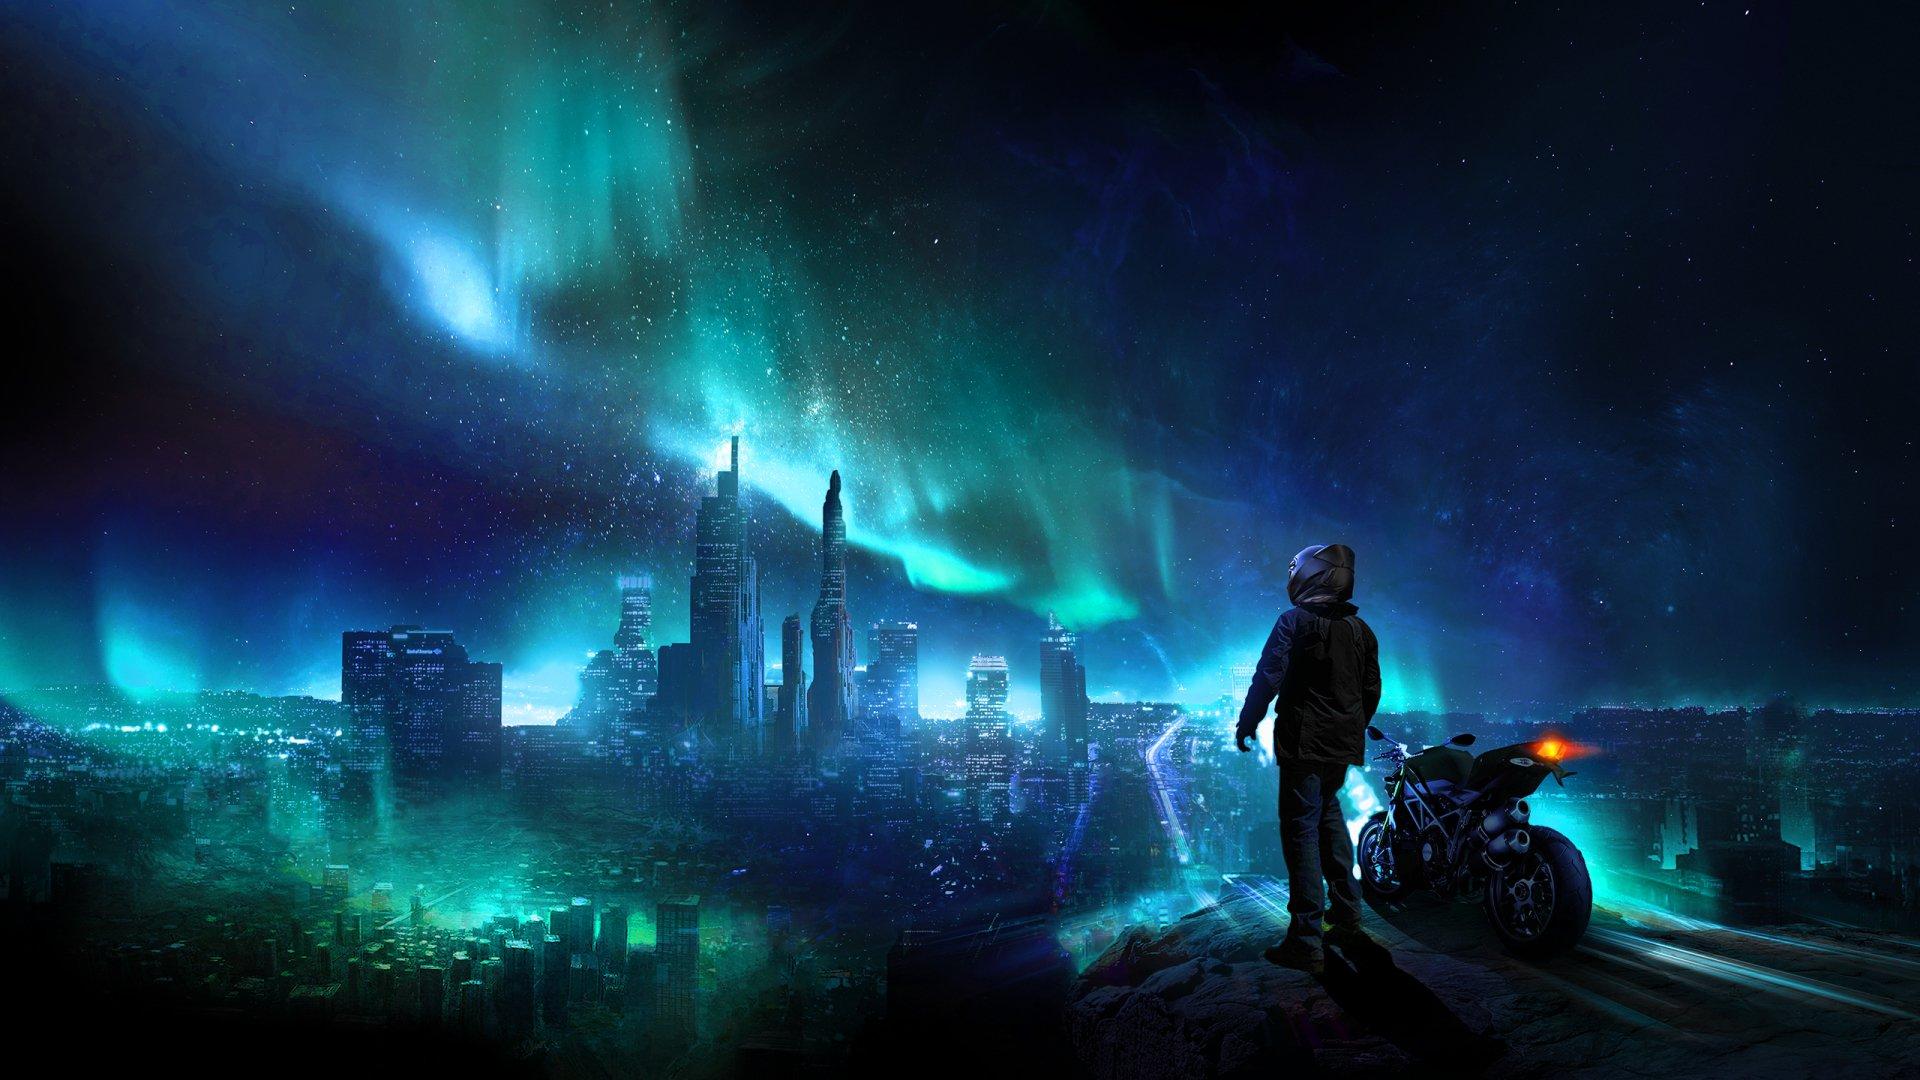 Sci Fi - City  Aurora Borealis Light Cityscape Night Colors Helmet Motorcycle Futuristic Wallpaper